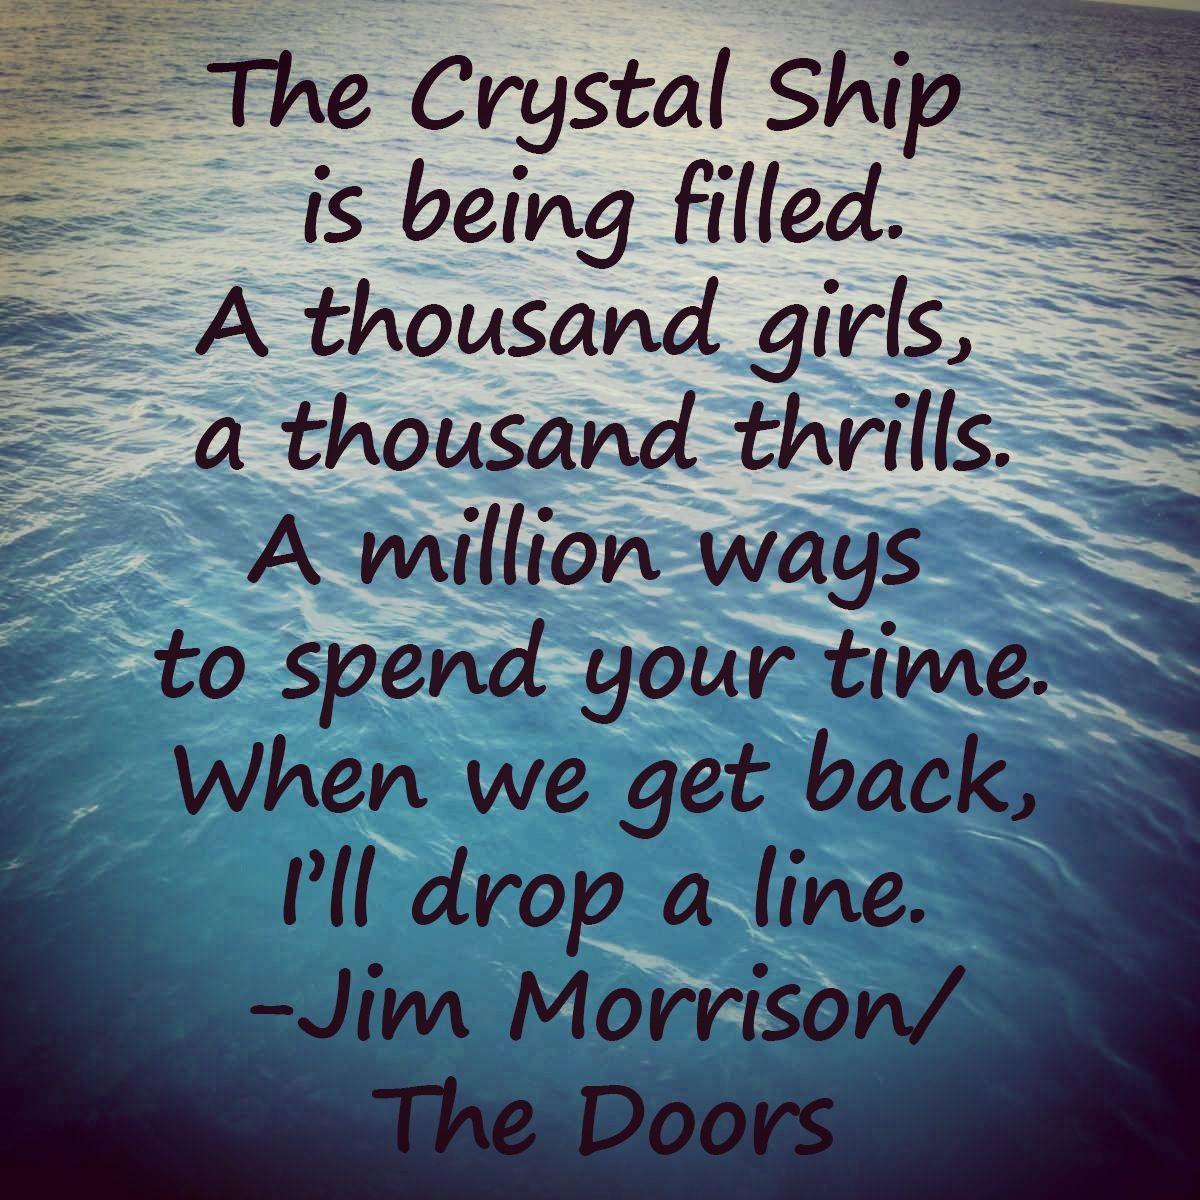 The Crystal Ship By The Doors Jimmorrison Thedoors Doors Lyrics